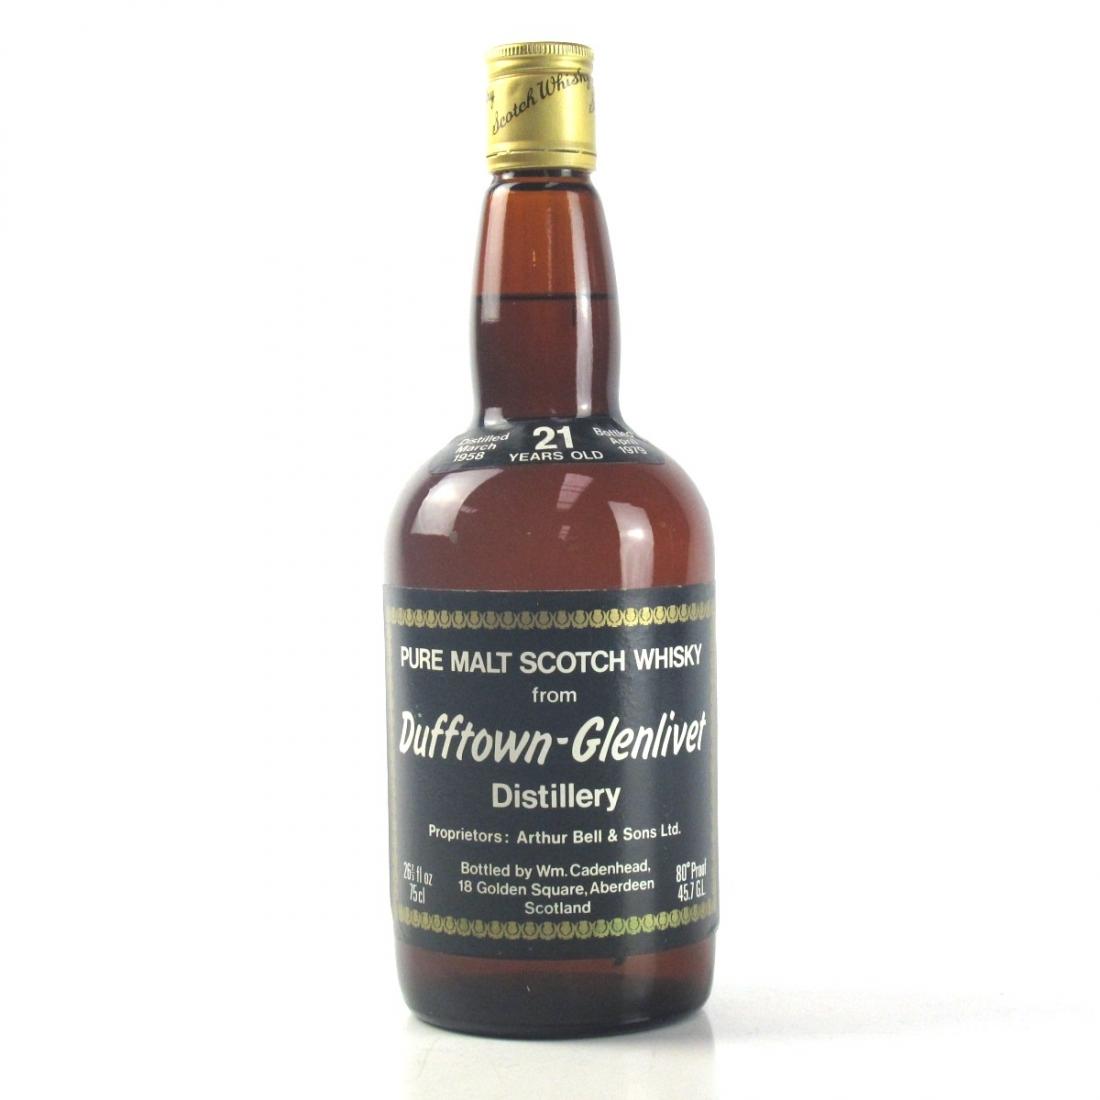 Dufftown-Glenlivet 1958 Cadenhead's 21 Year Old